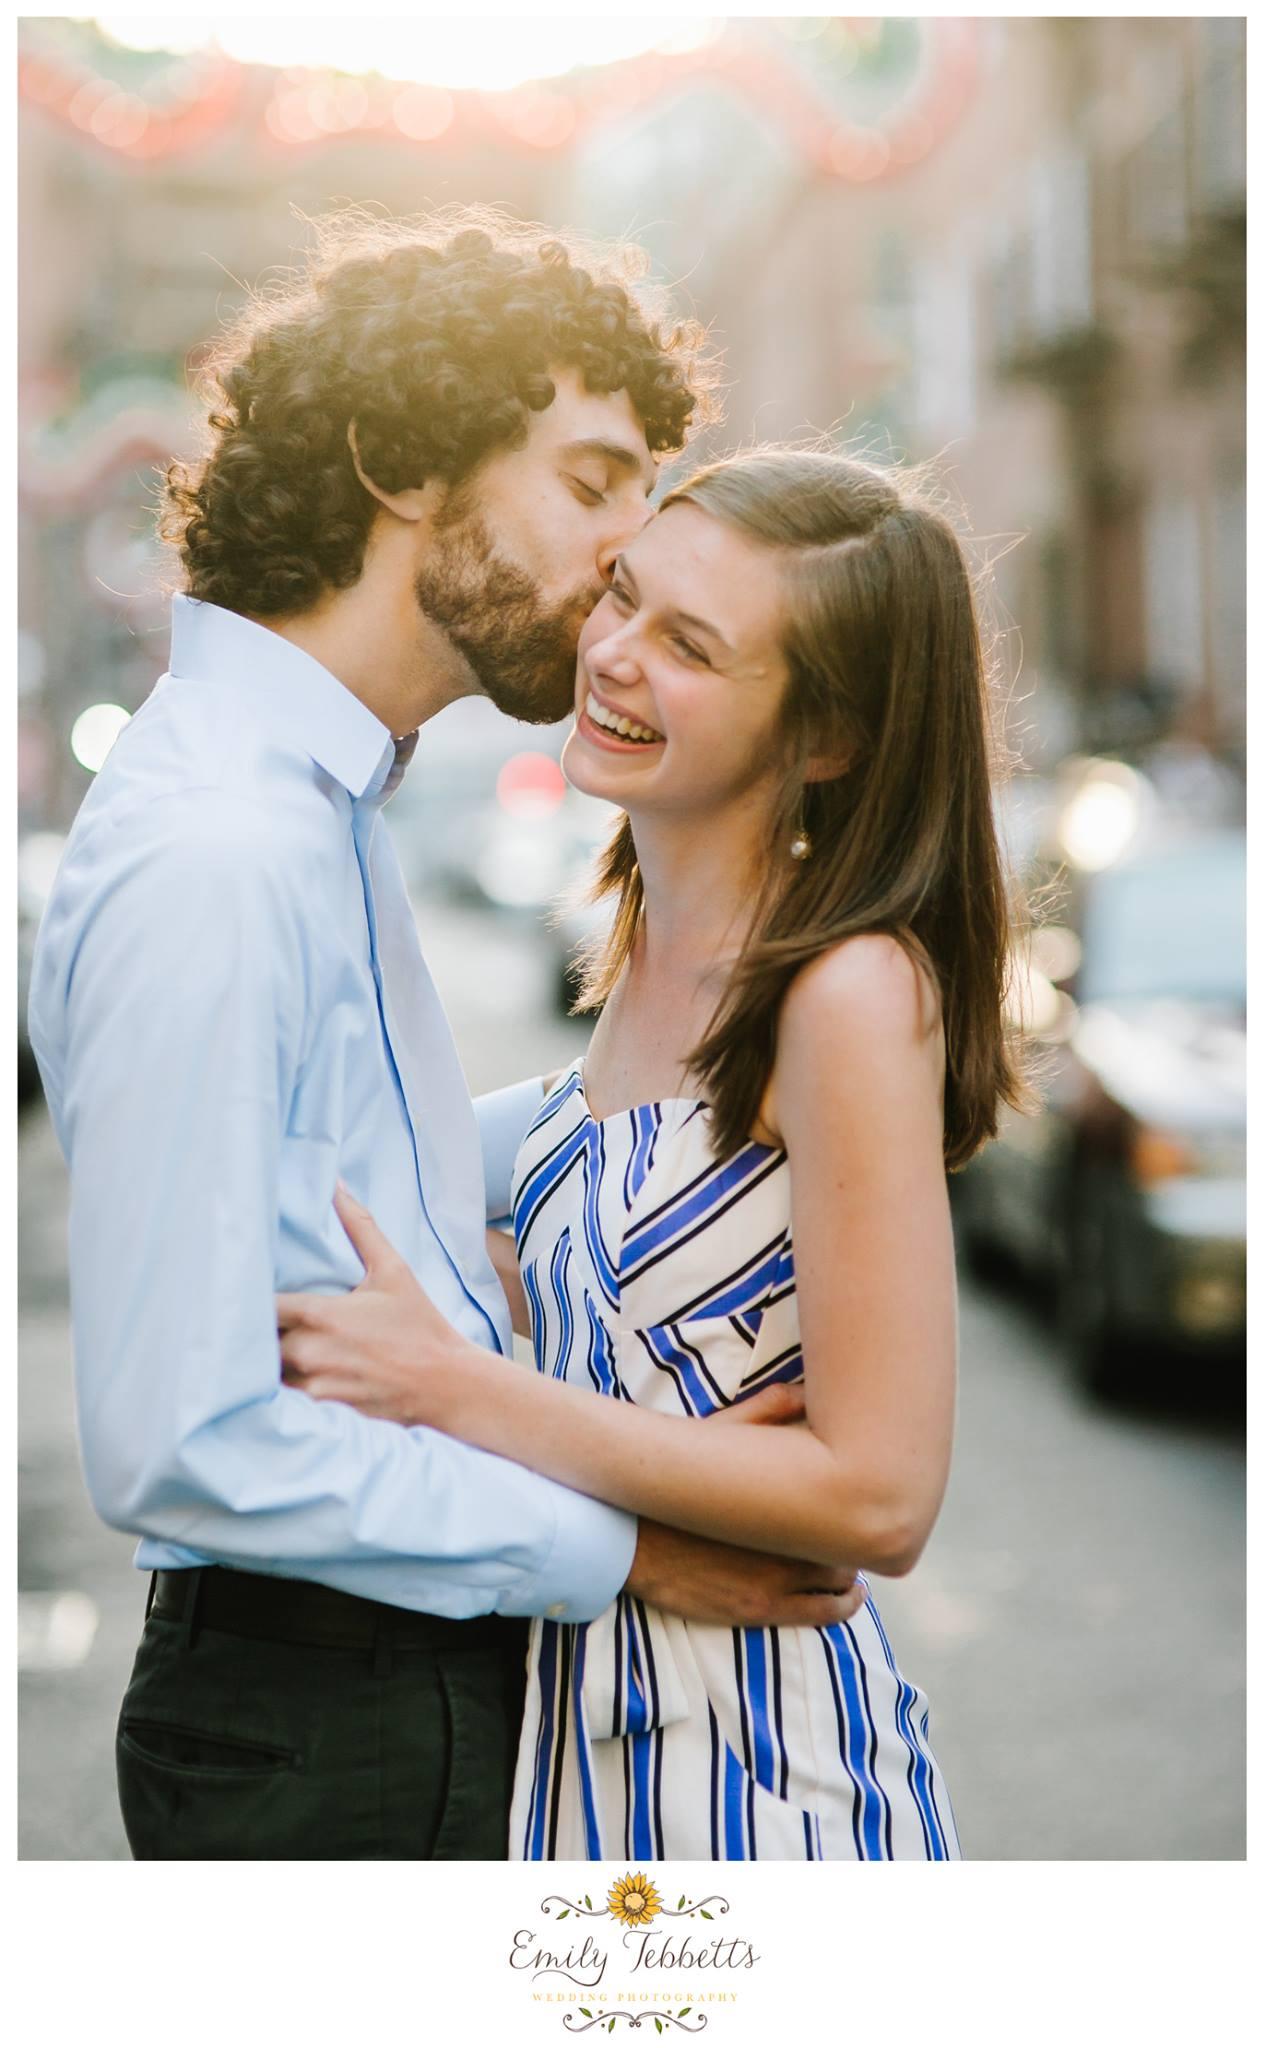 Emily Tebbetts Wedding Photography - North End Engagement Session Sneak Peeks 1.jpg